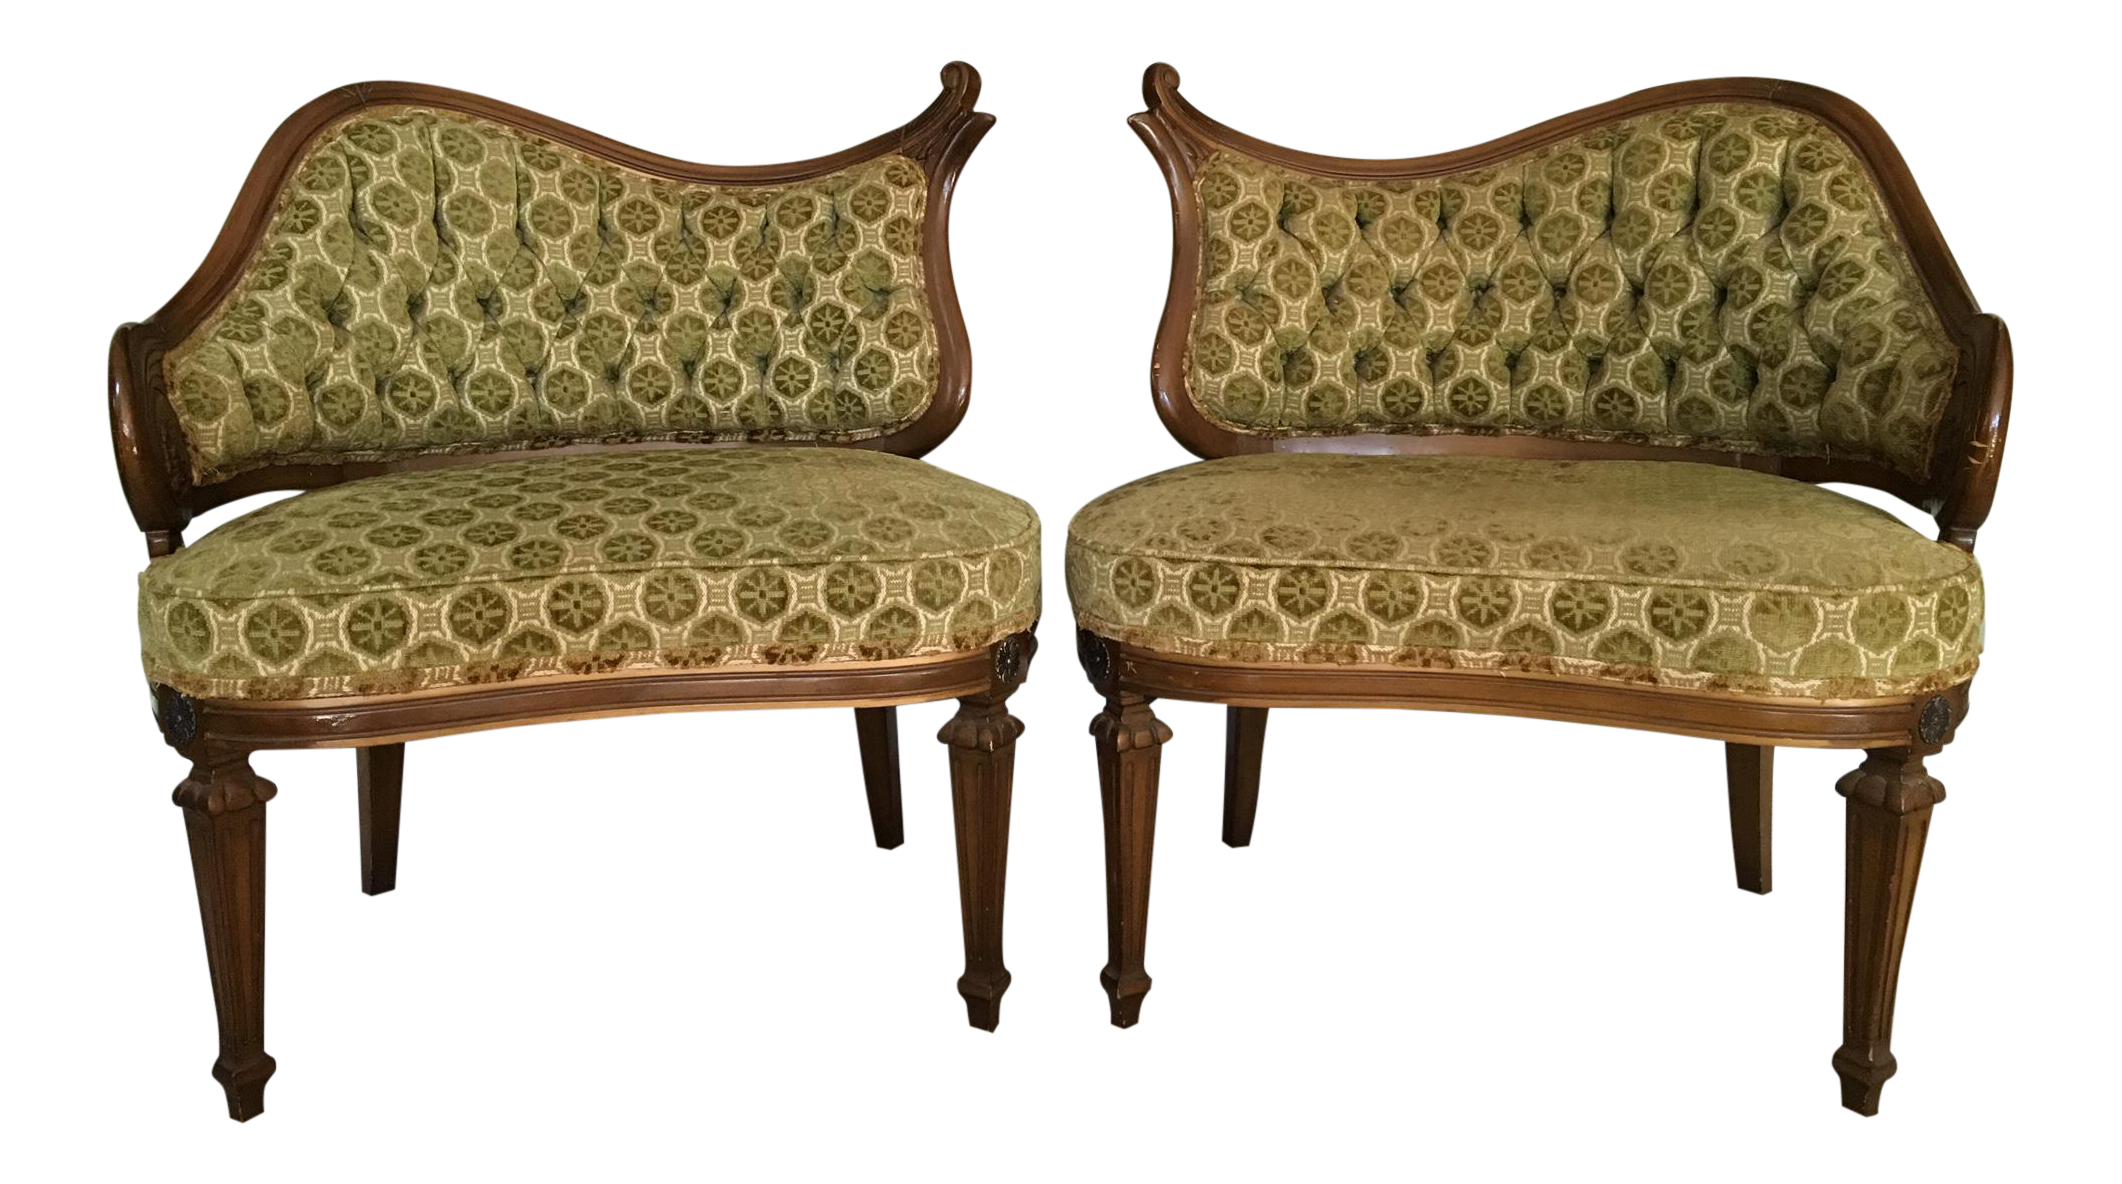 Hollywood Regency Single Arm Fireside Chairs   A Pair